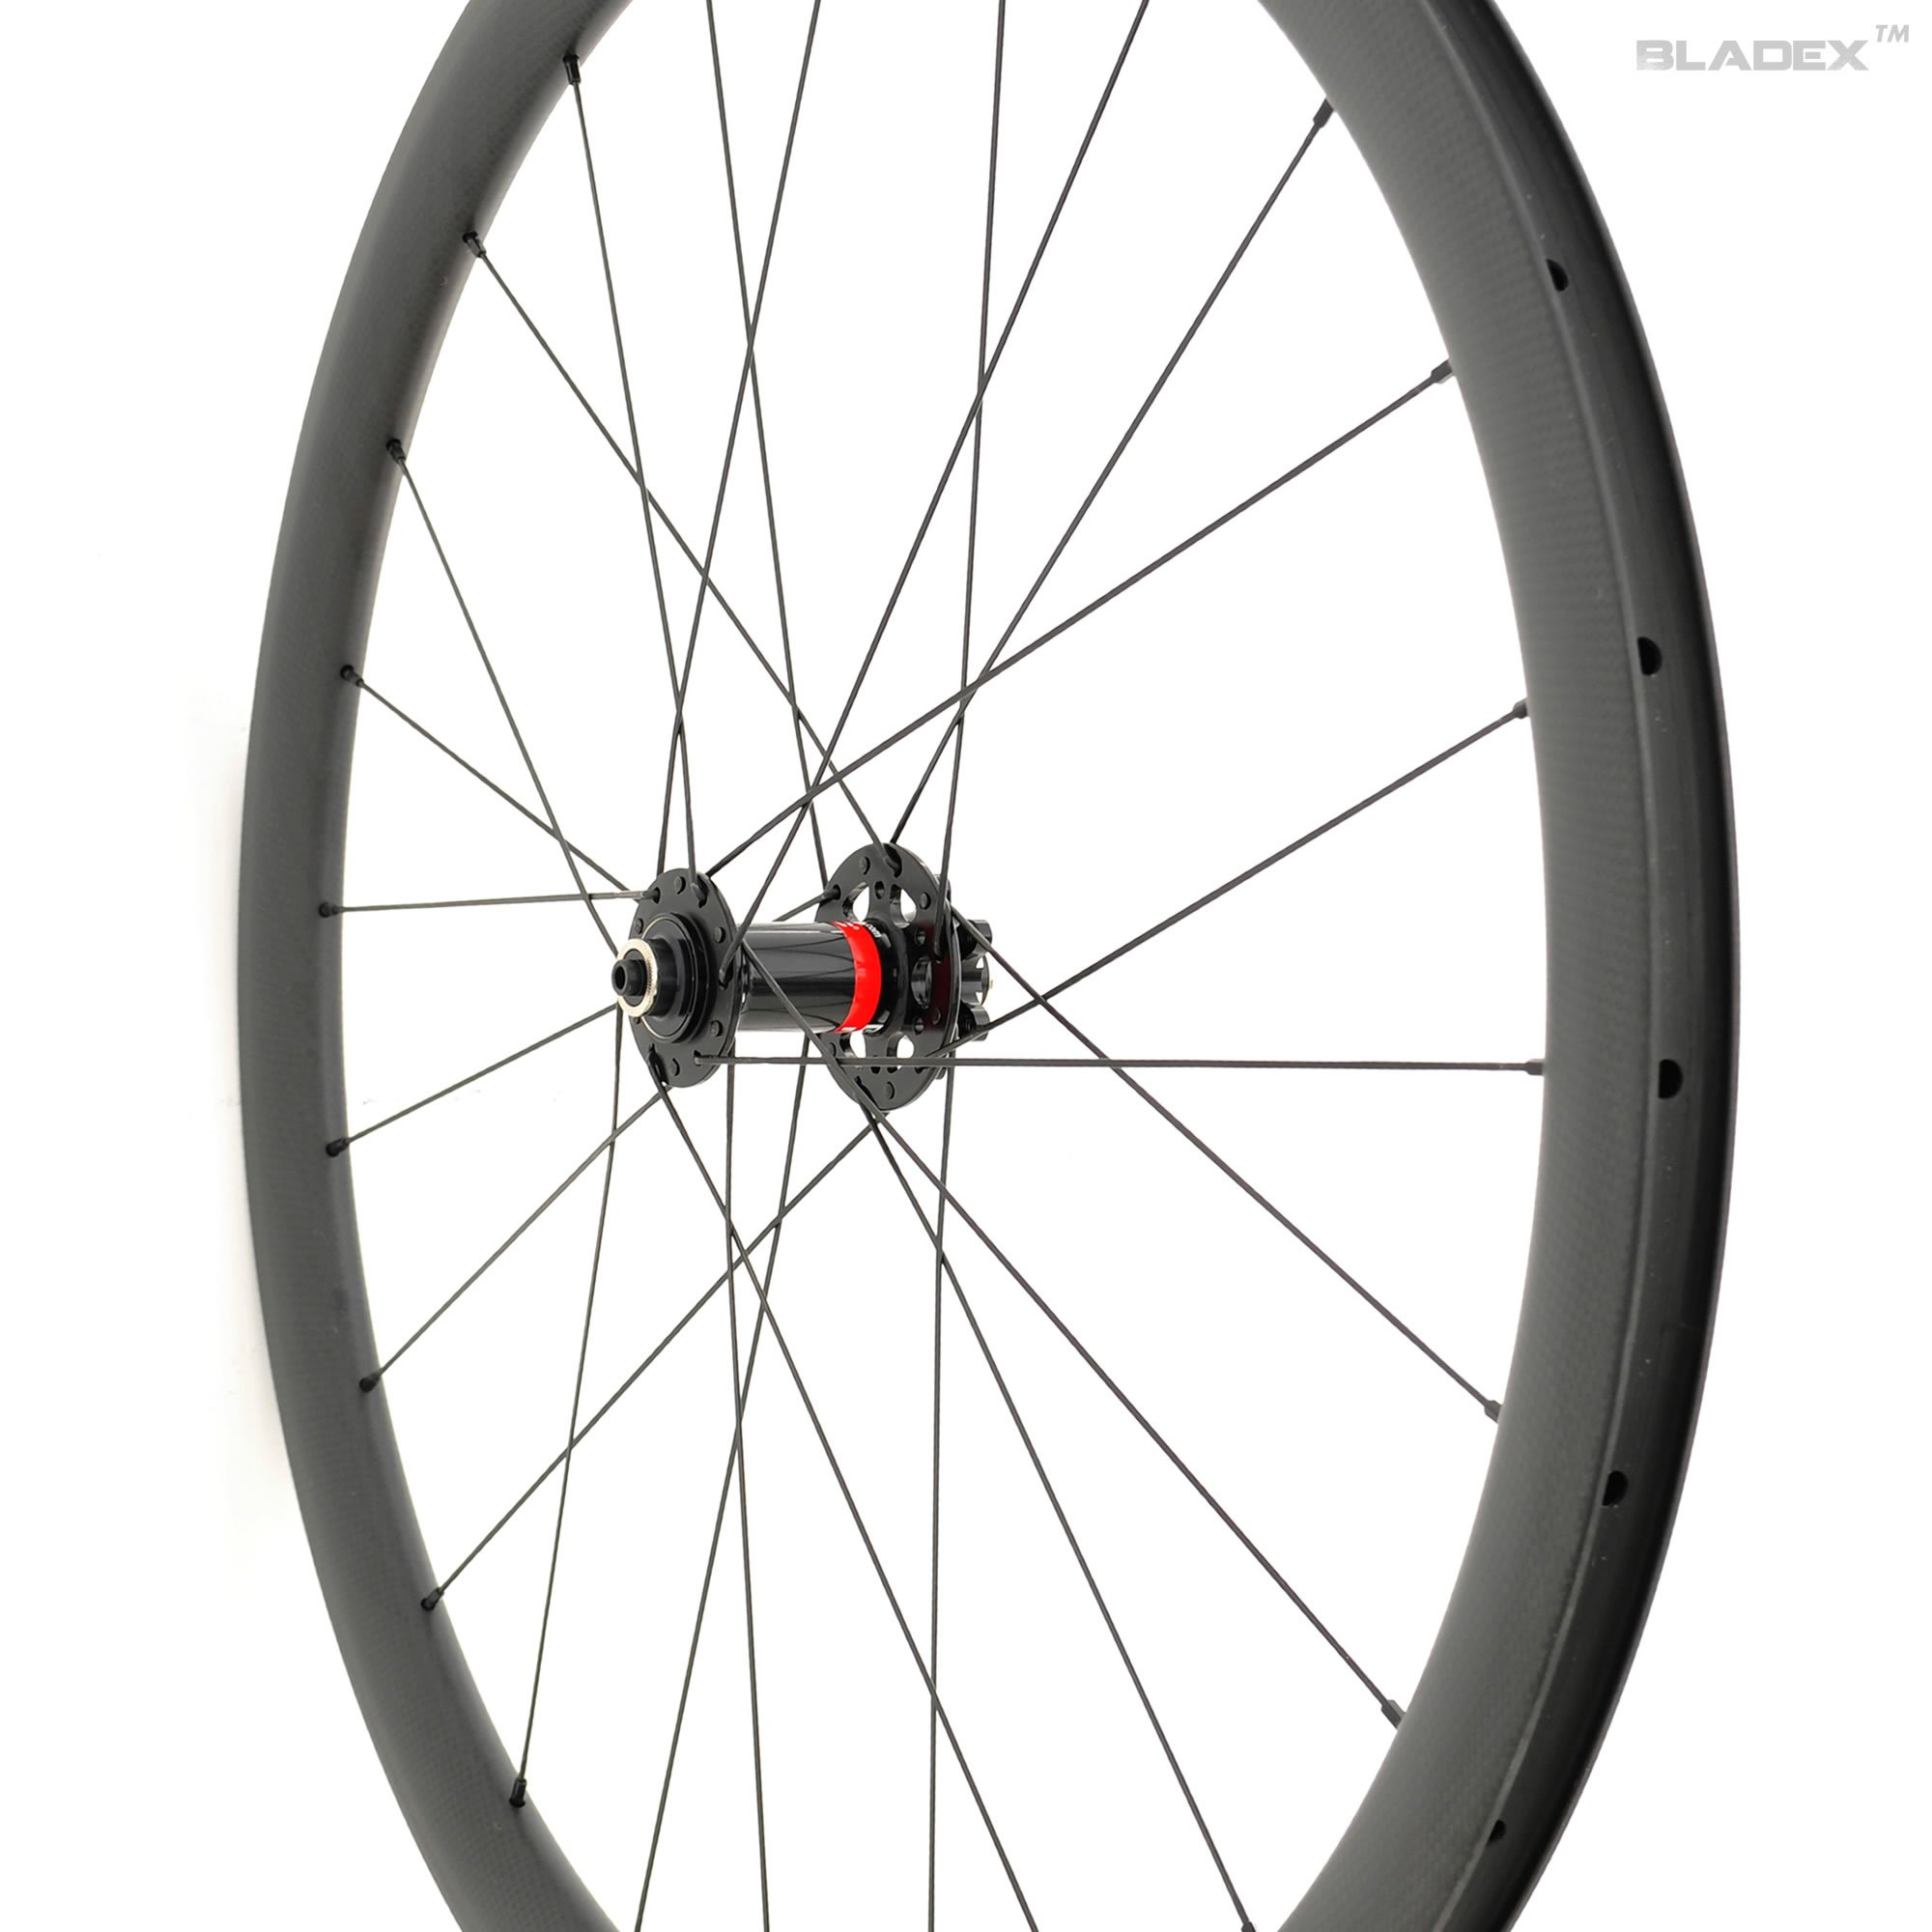 SDM 4X4 Road Disc Brake Carbon Front Wheel